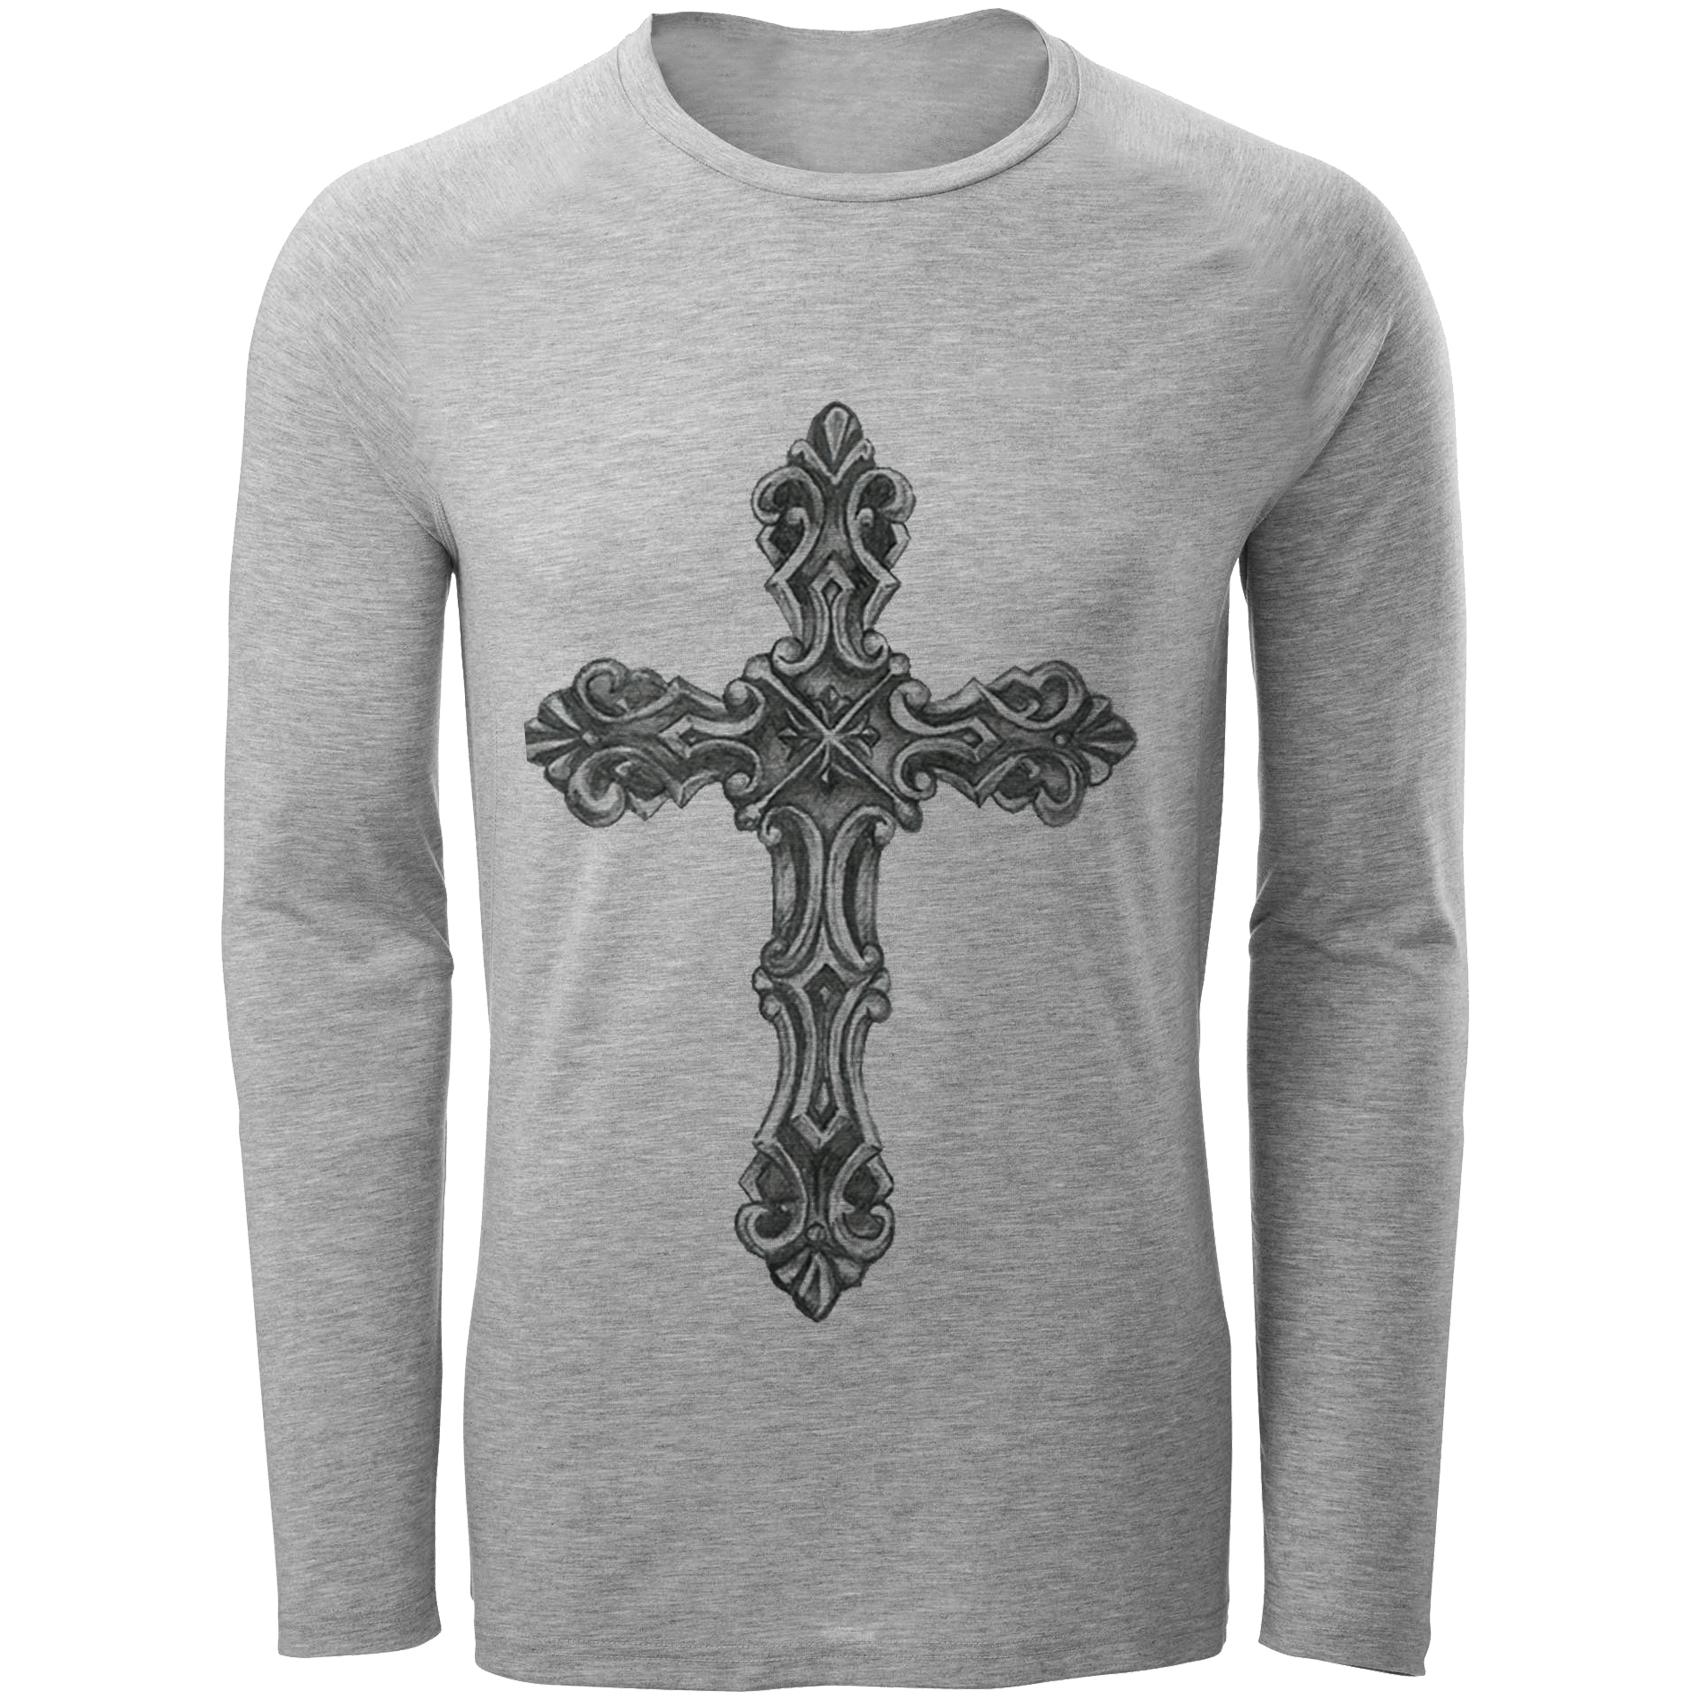 تی شرت مردانه طرح صلیب کد C45